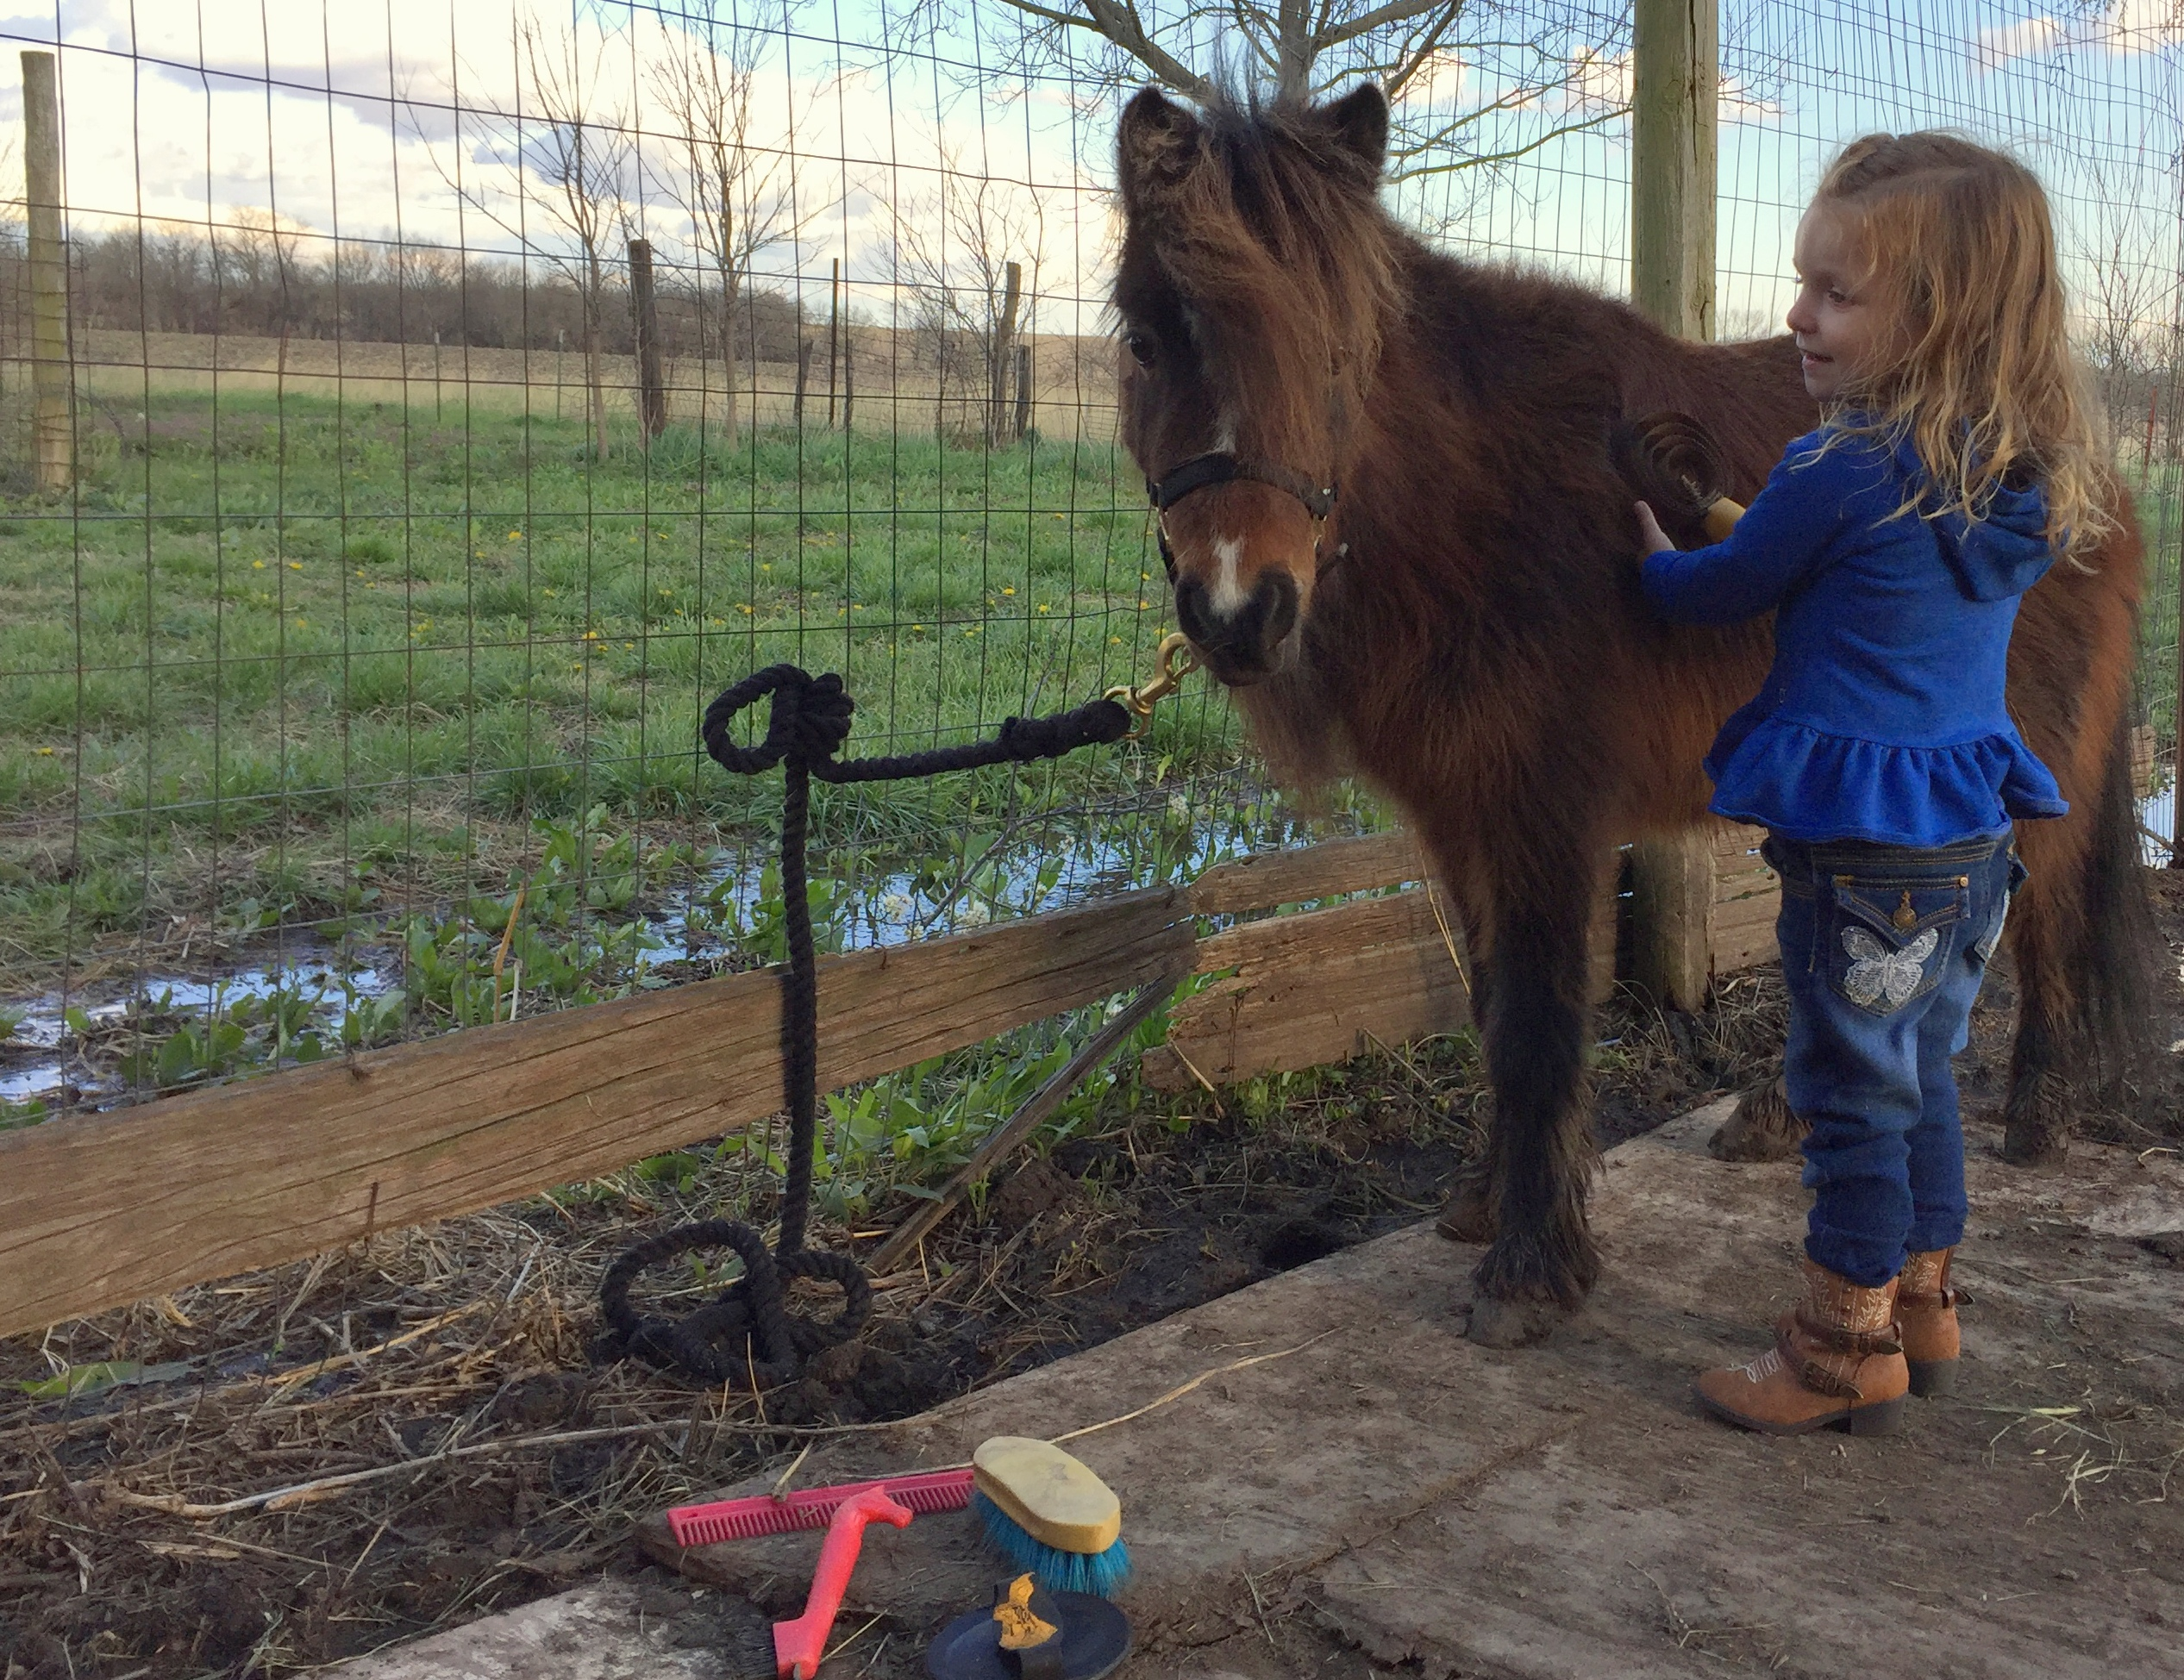 bryarton farm my little pony an answered prayer and a diy dress